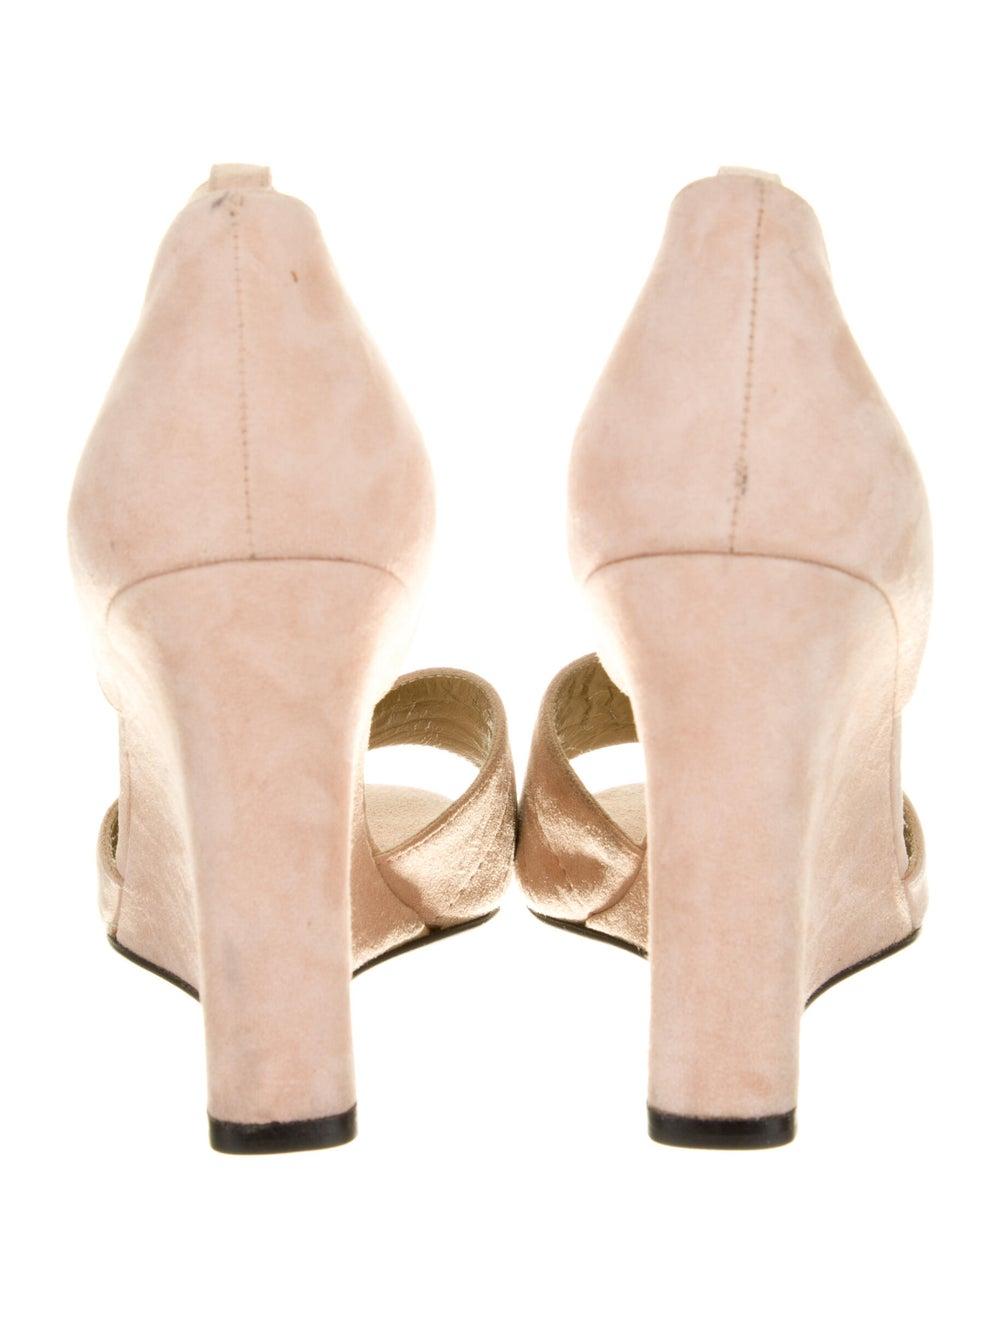 Gianni Versace Vintage Suede Sandals - image 4